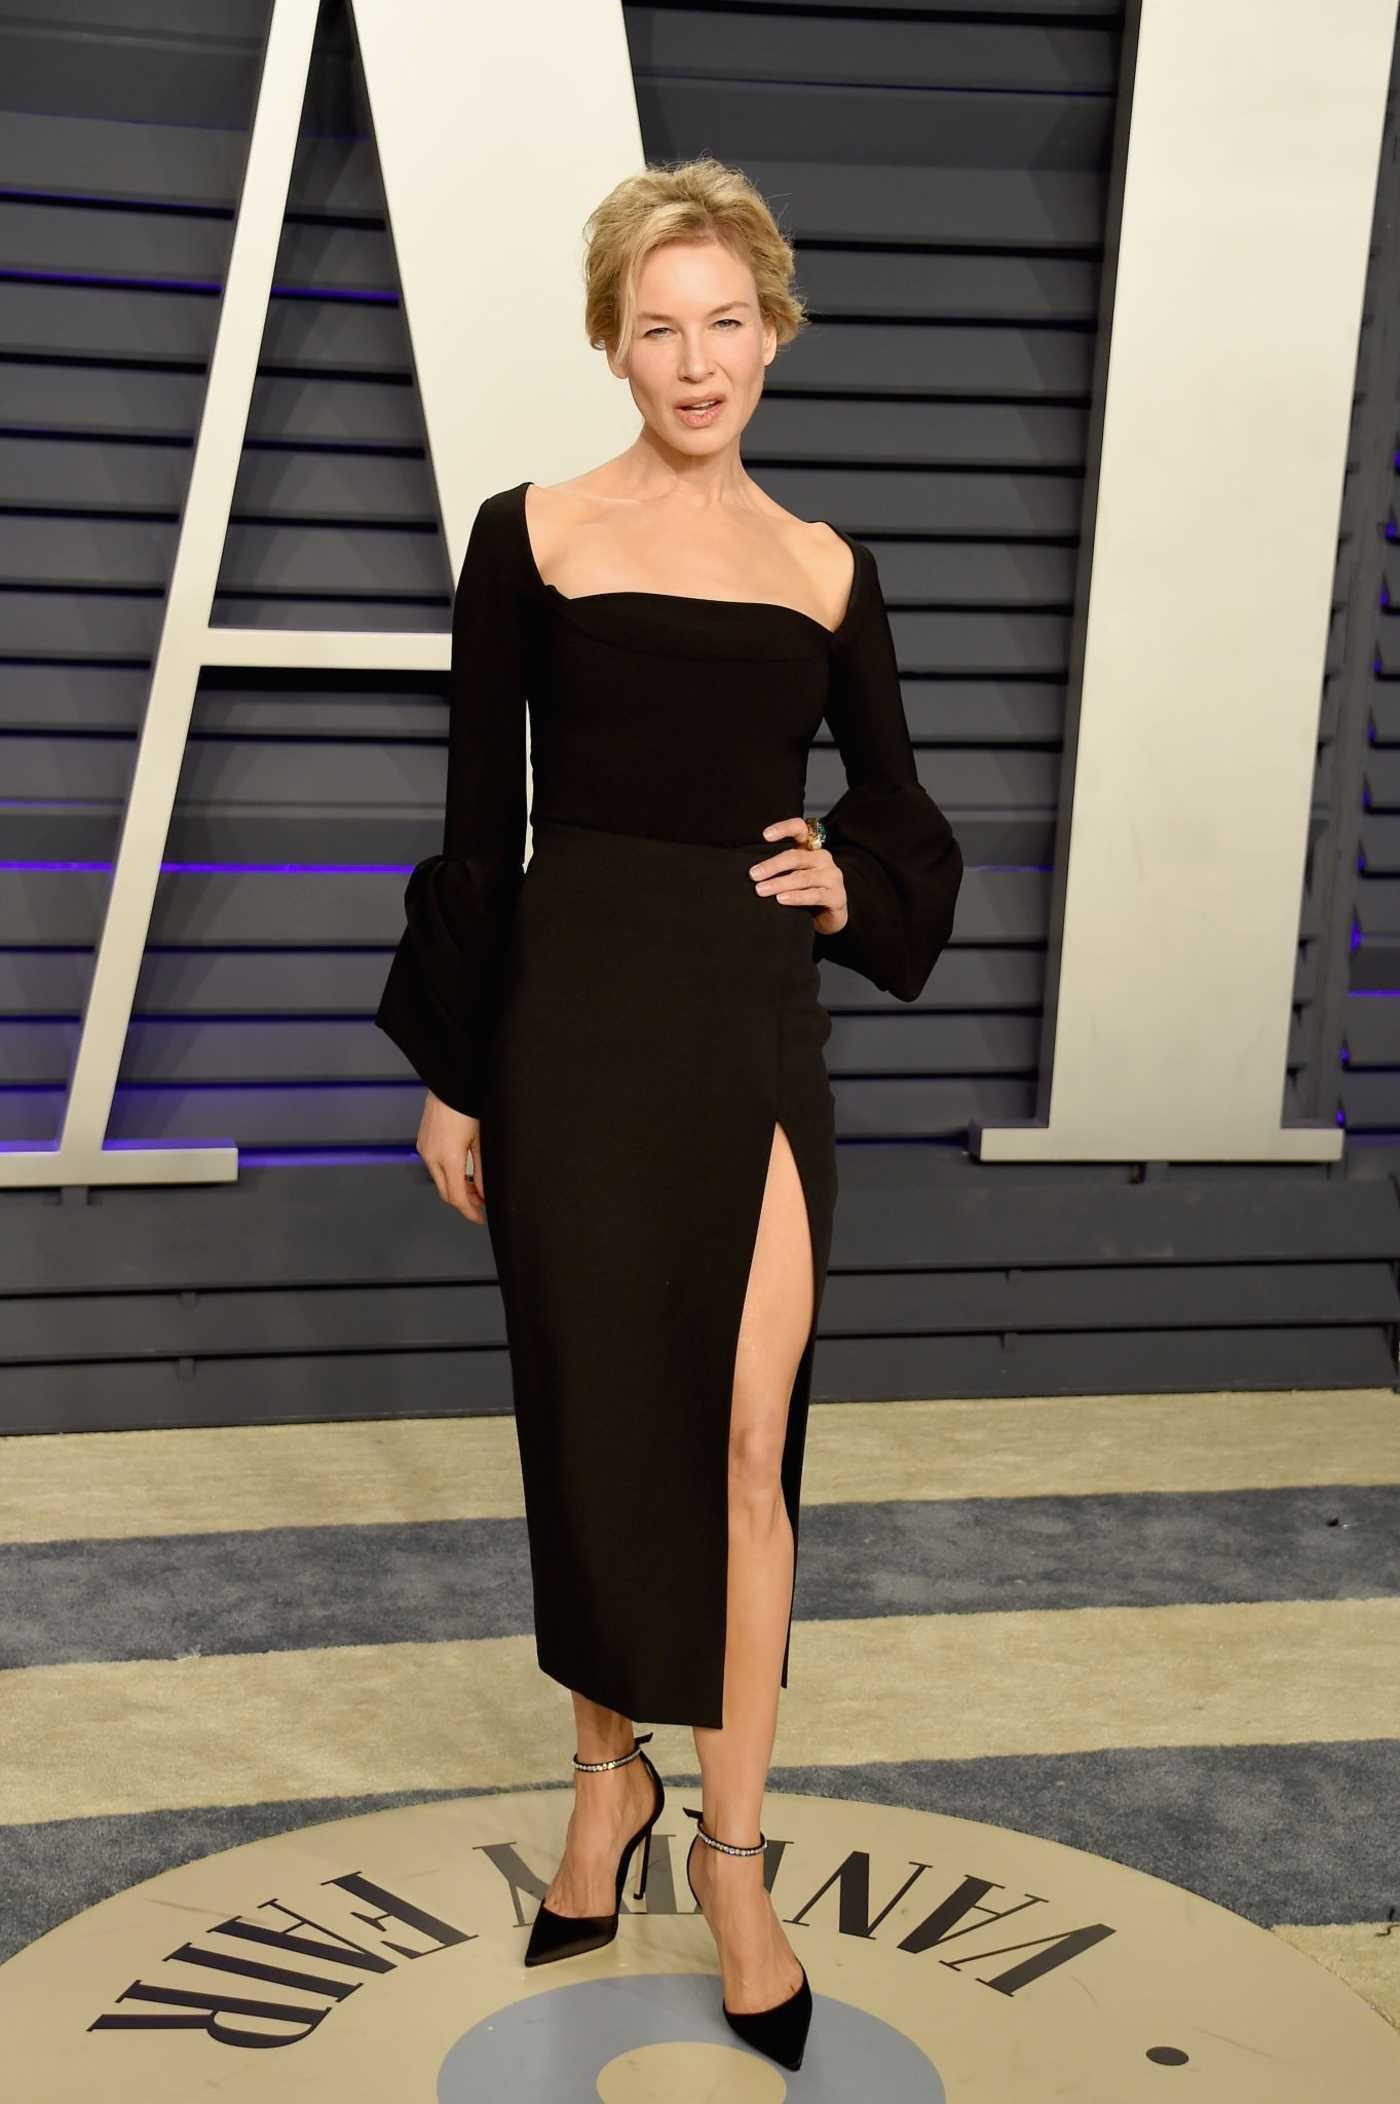 Renee Zellweger Attends 2019 Vanity Fair Oscar Party in Beverly Hills 02/24/2019